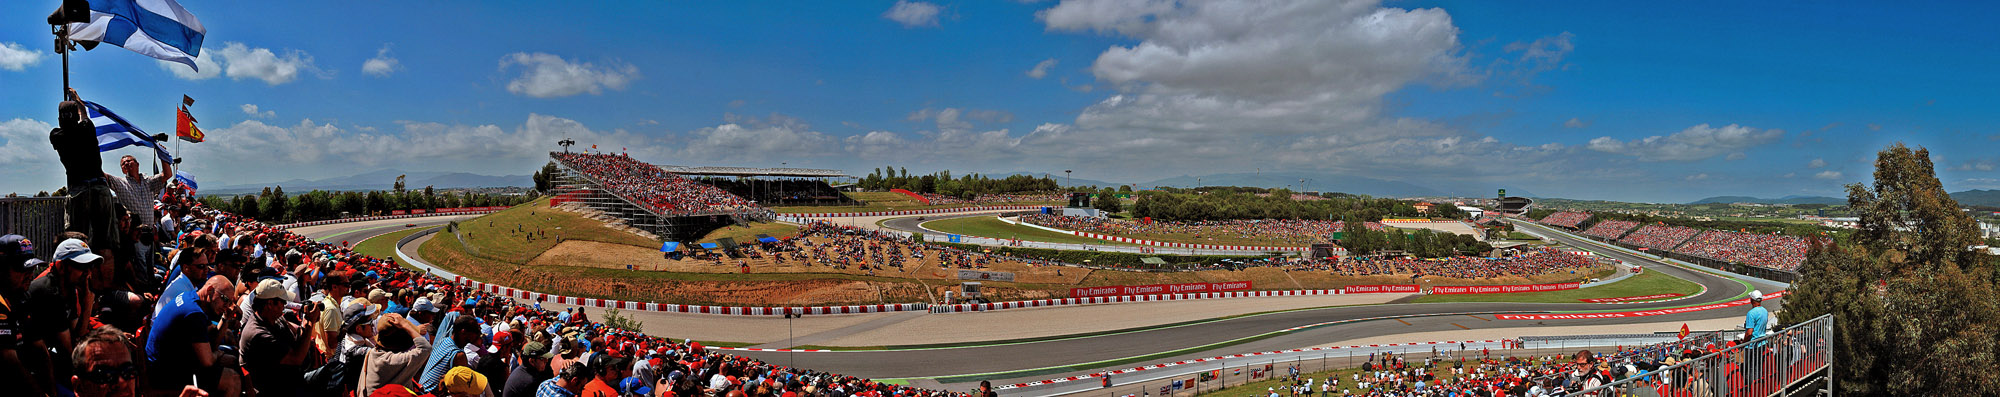 Circuito Montmelo : Circuito de barcelona cataluña mapio